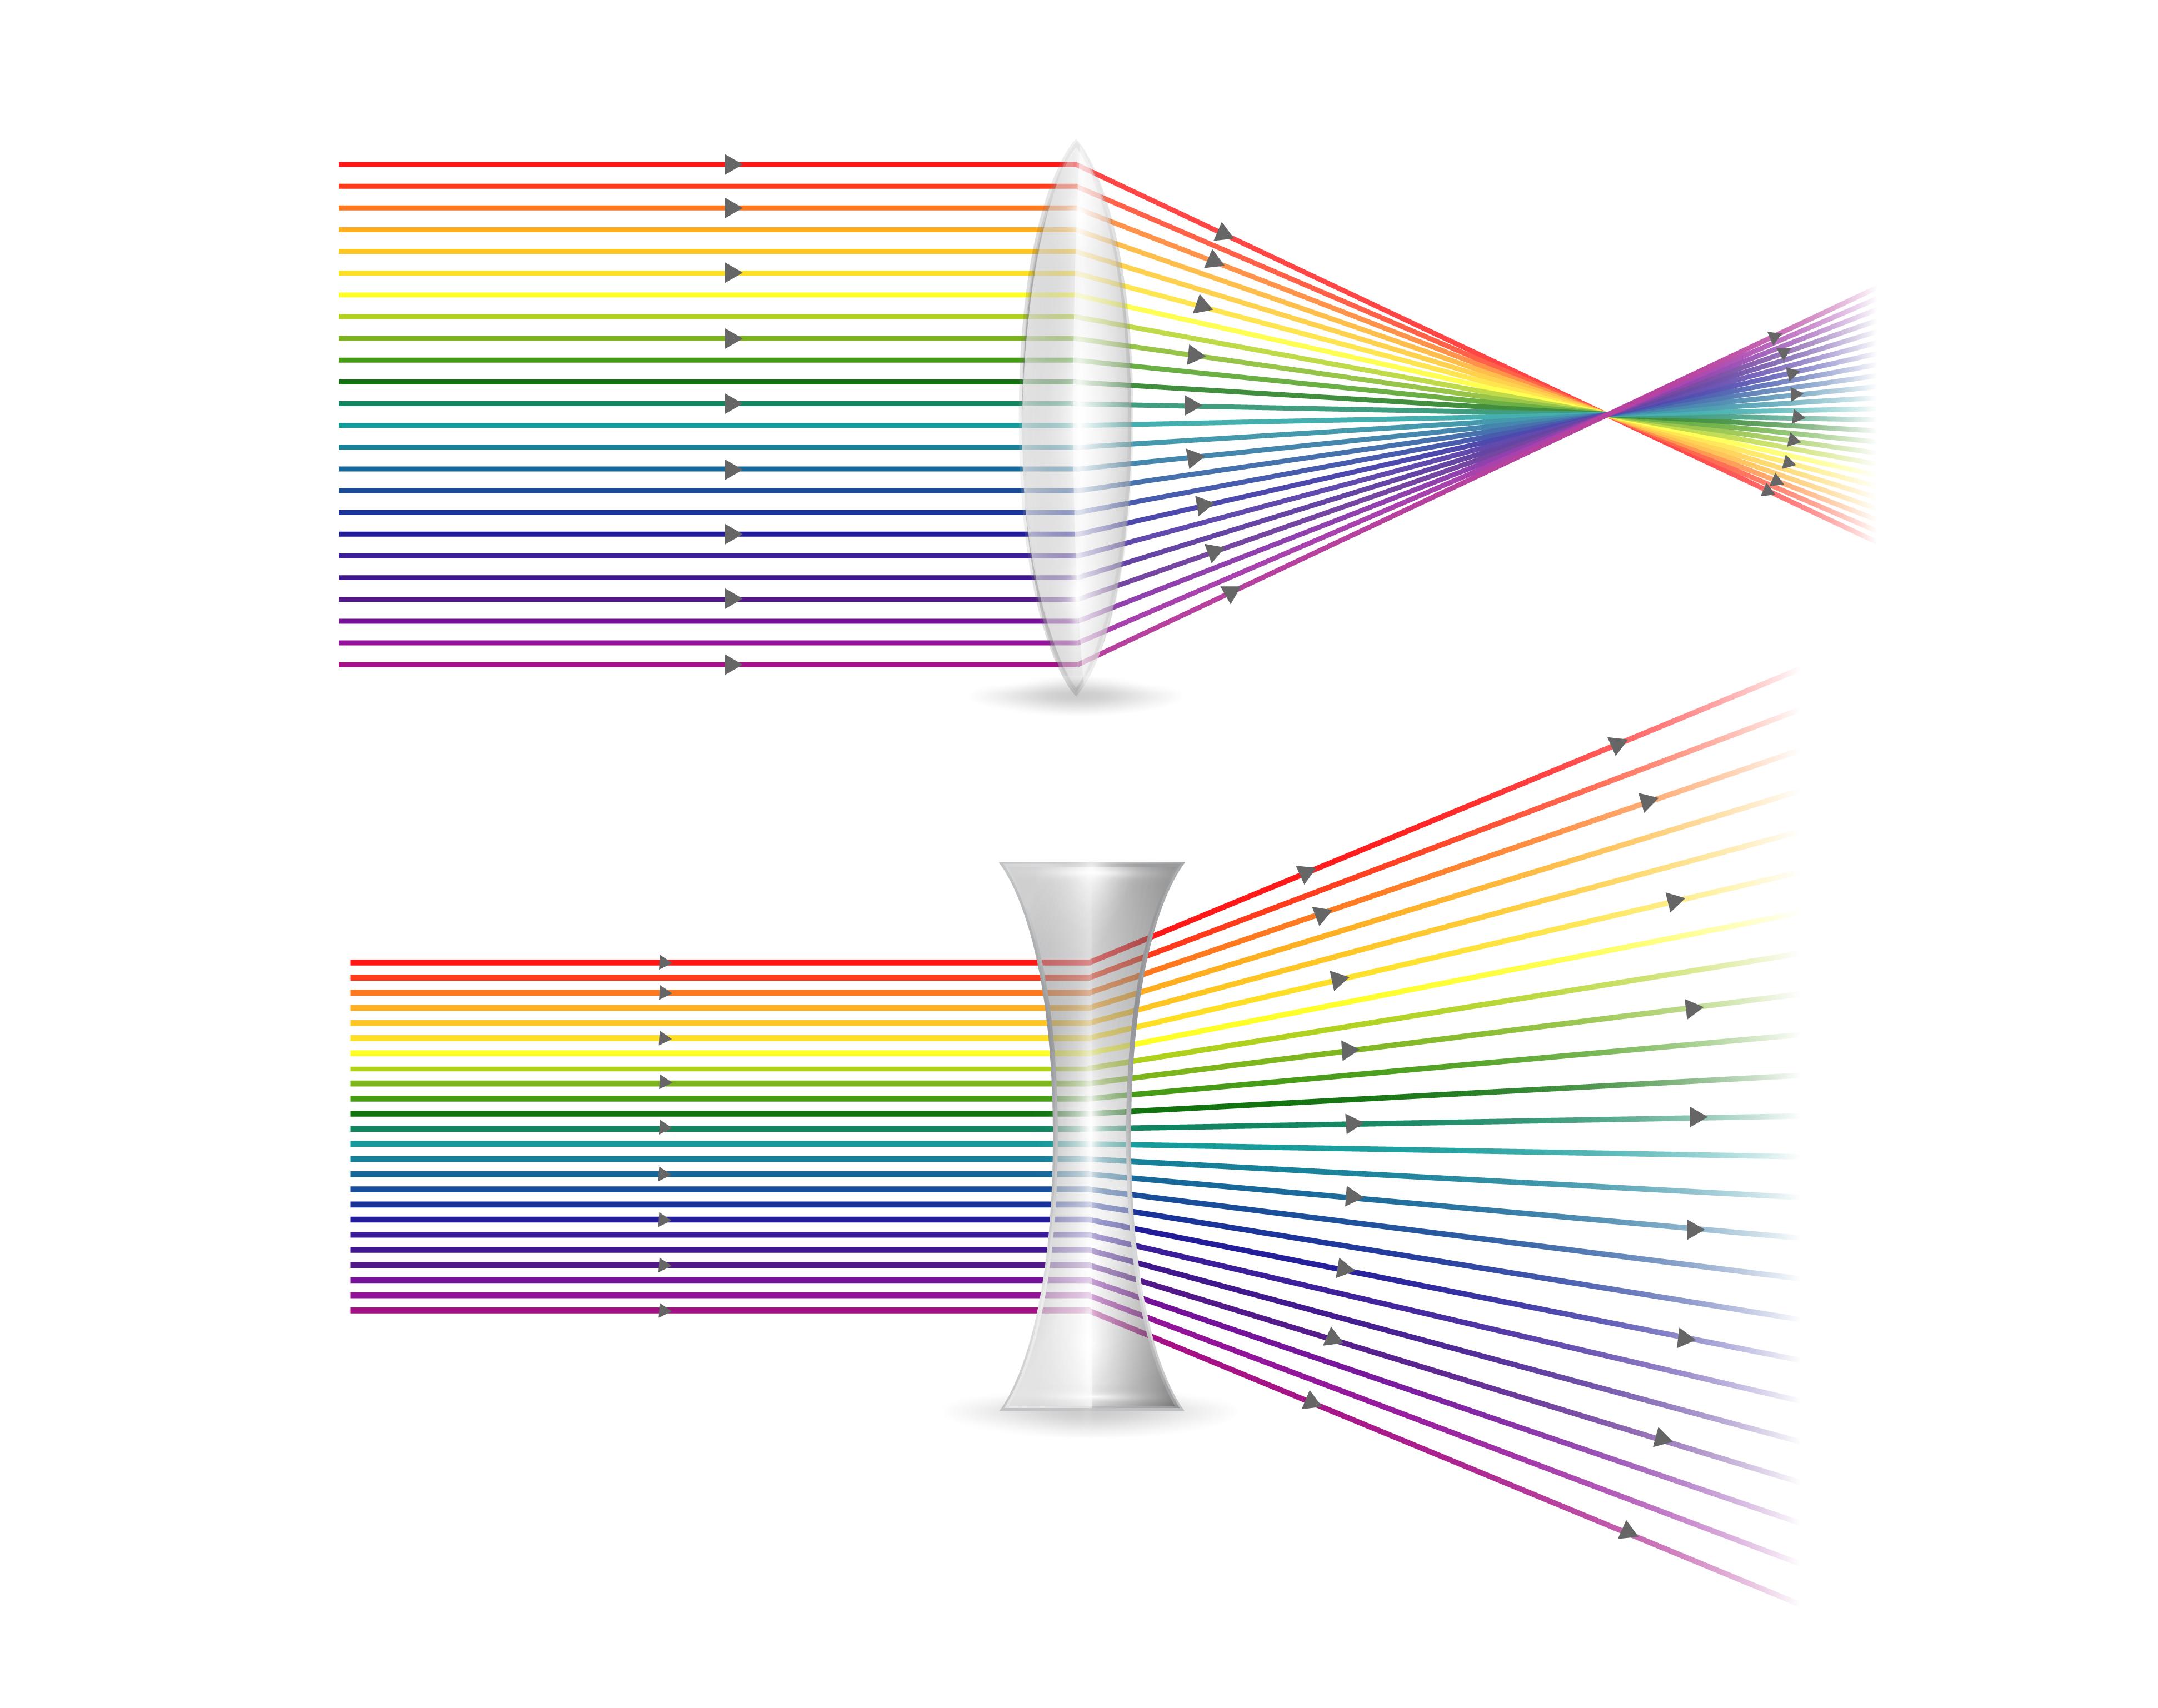 Optics Physics Refraction Of Light When Light Travels